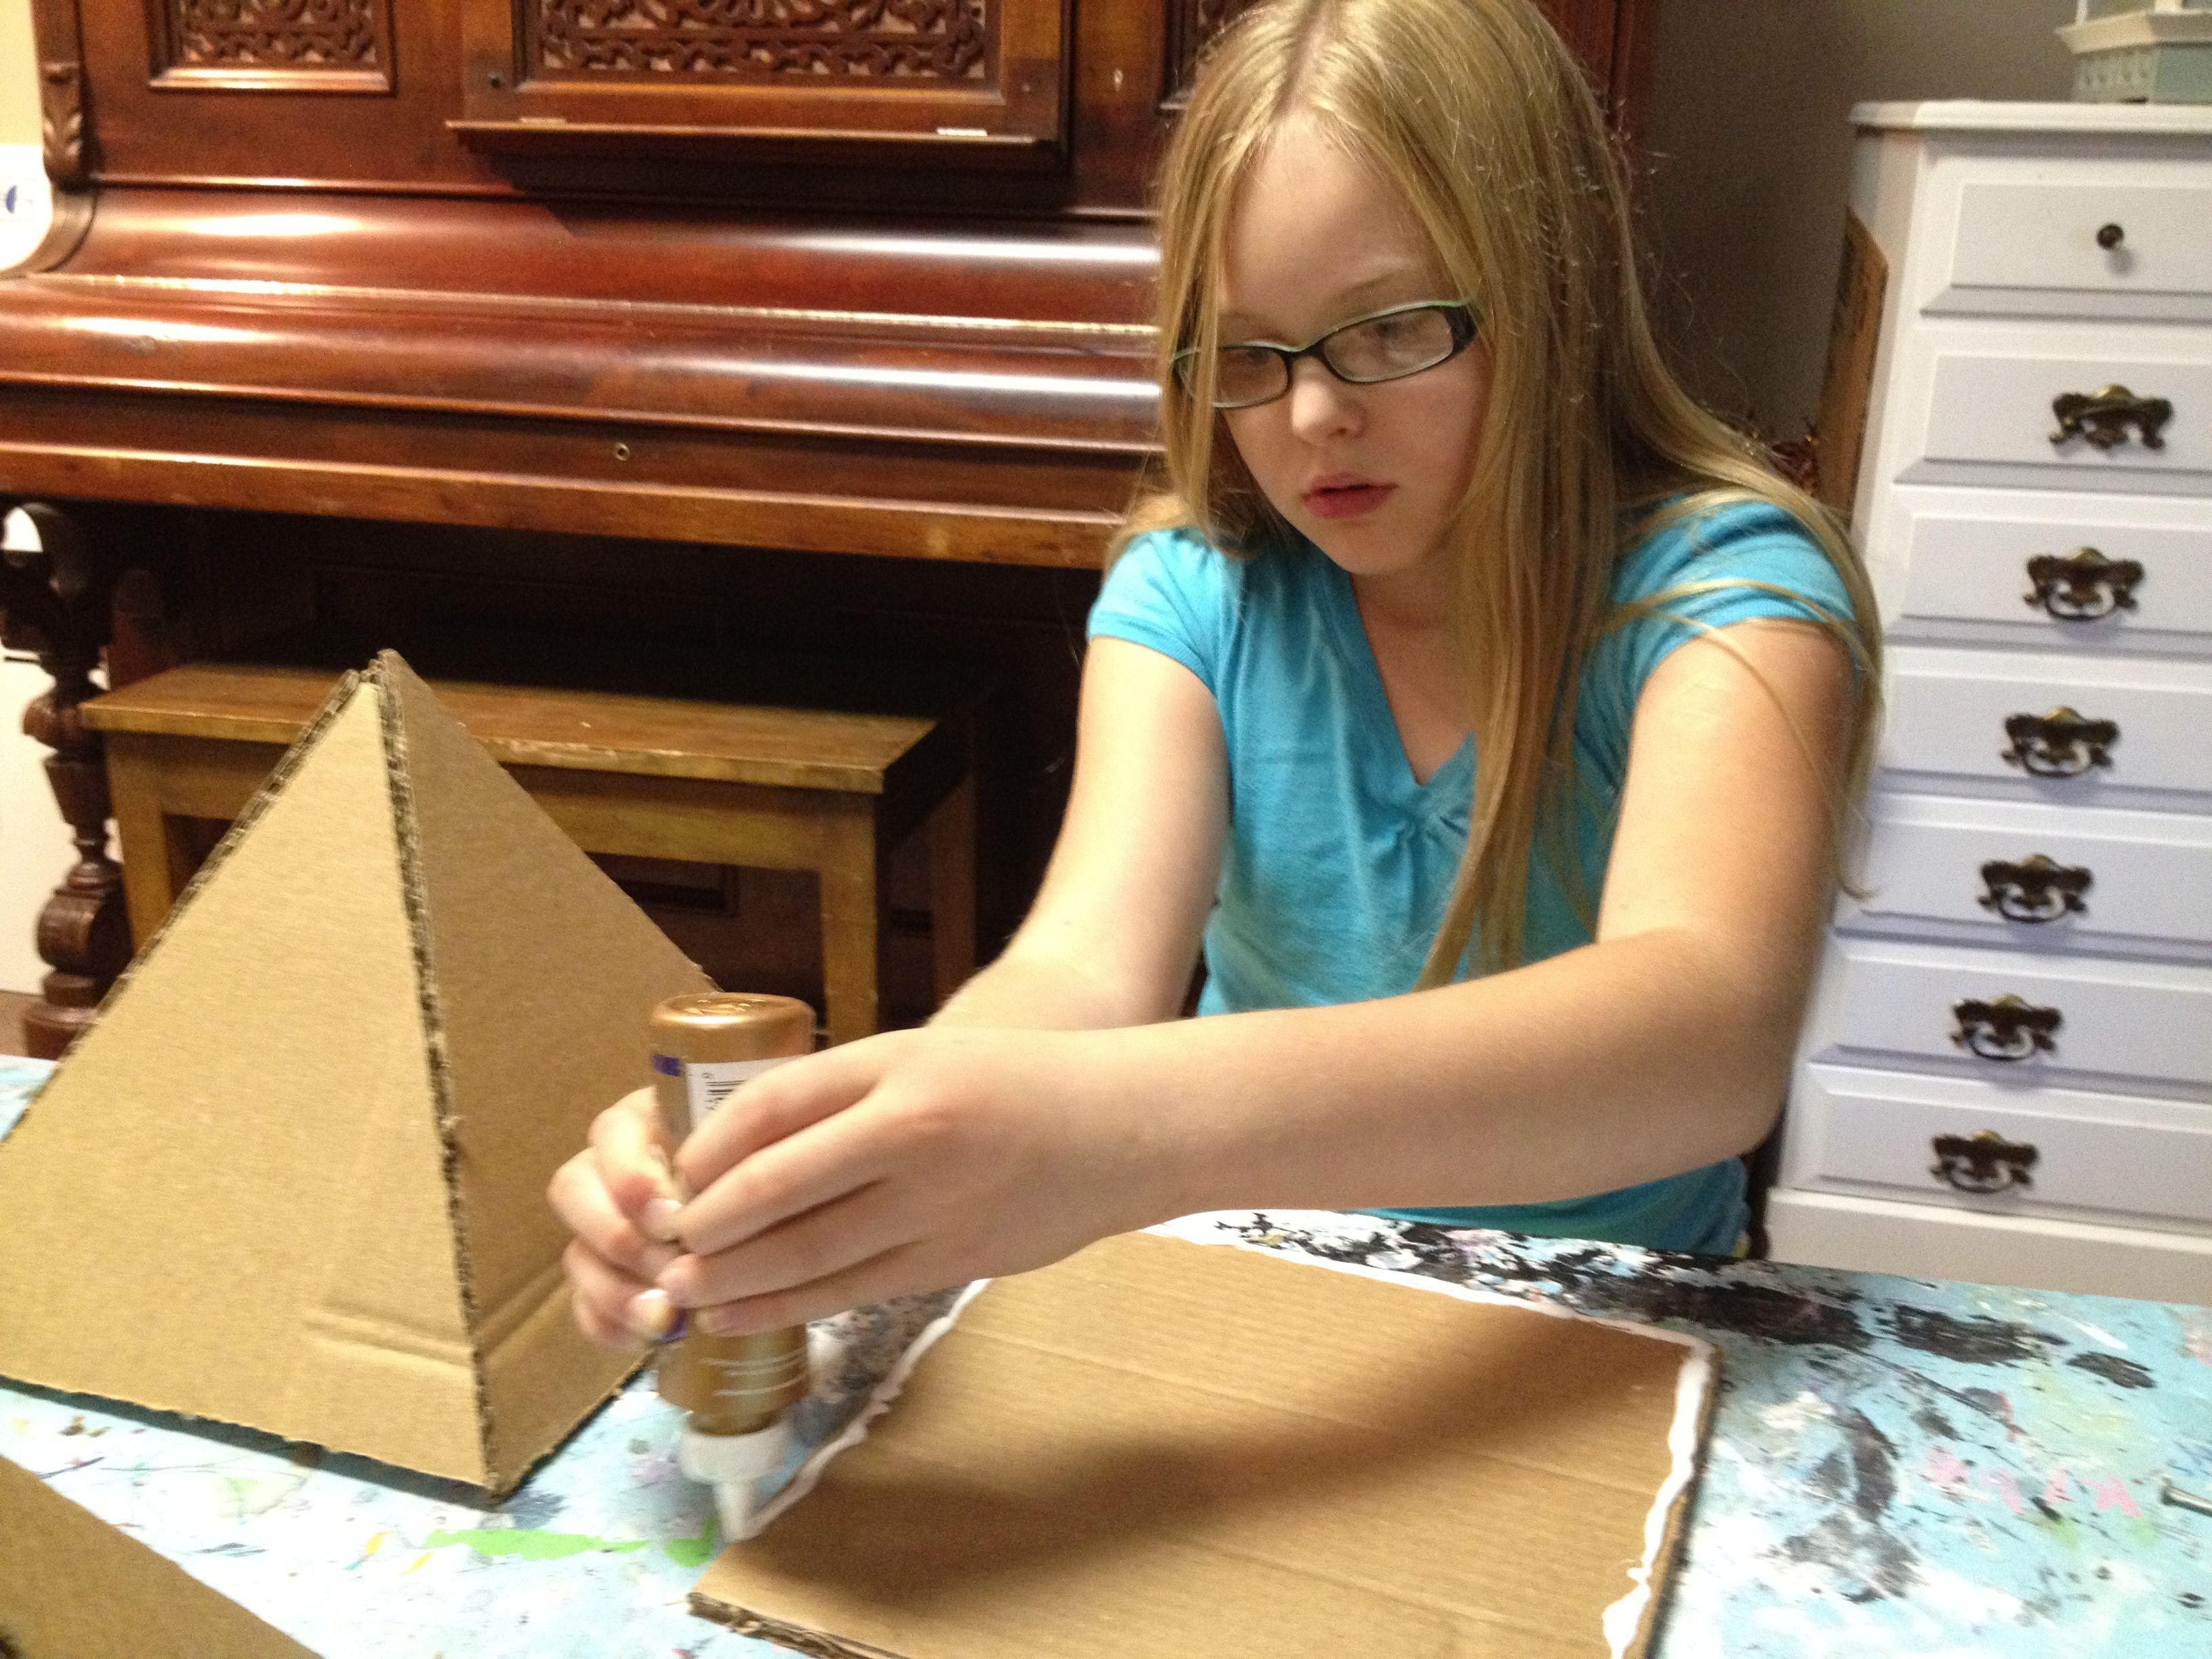 DIY Cardboard Pyramid - great tutorial | Egypt Study - J | Pinterest ...